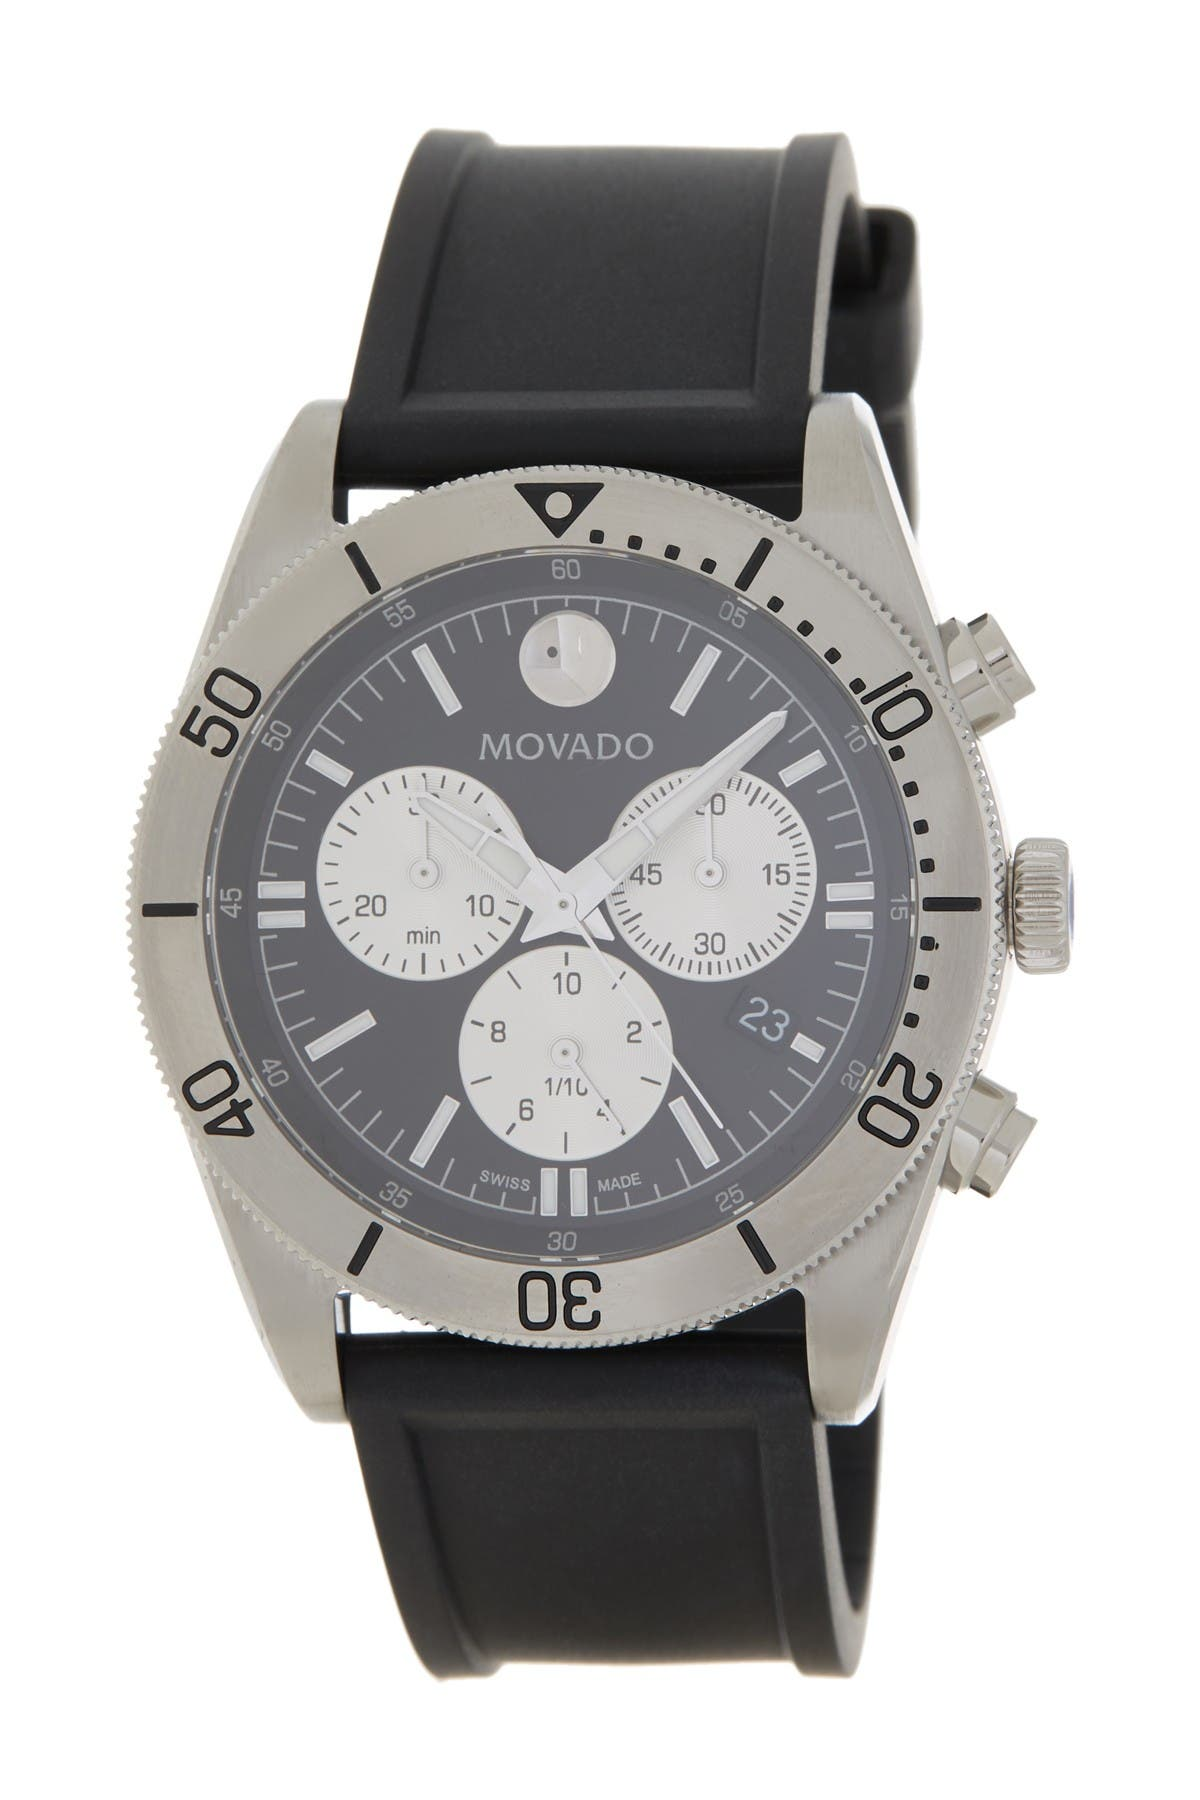 Image of Movado Men's Movado Sport Series Rubber Watch, 41mm